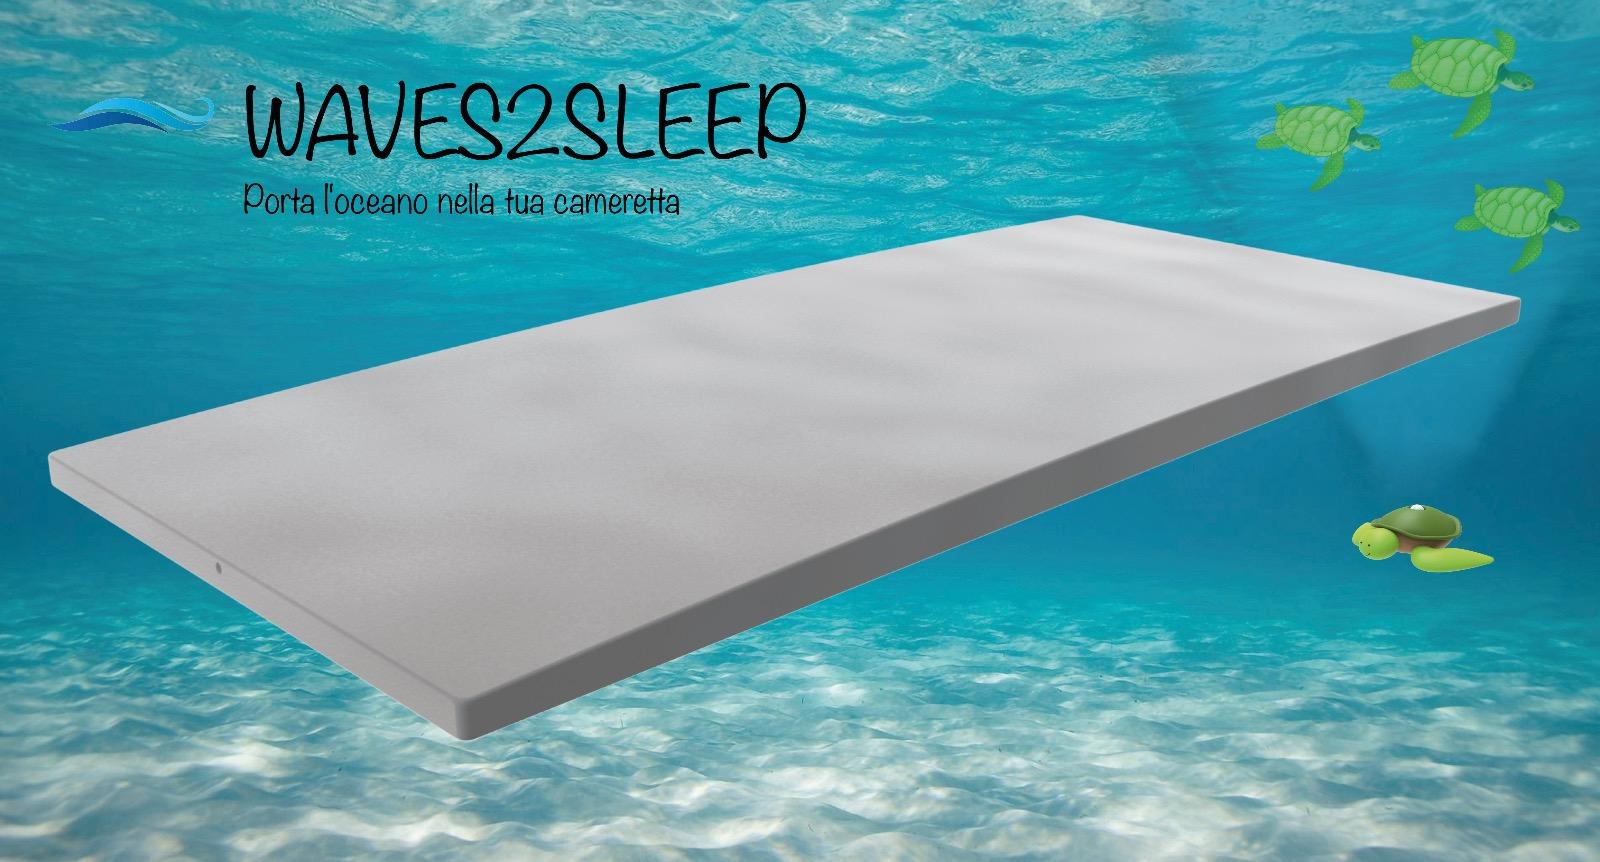 WAVES2SLEEP: porta l'oceano nella tua cameretta